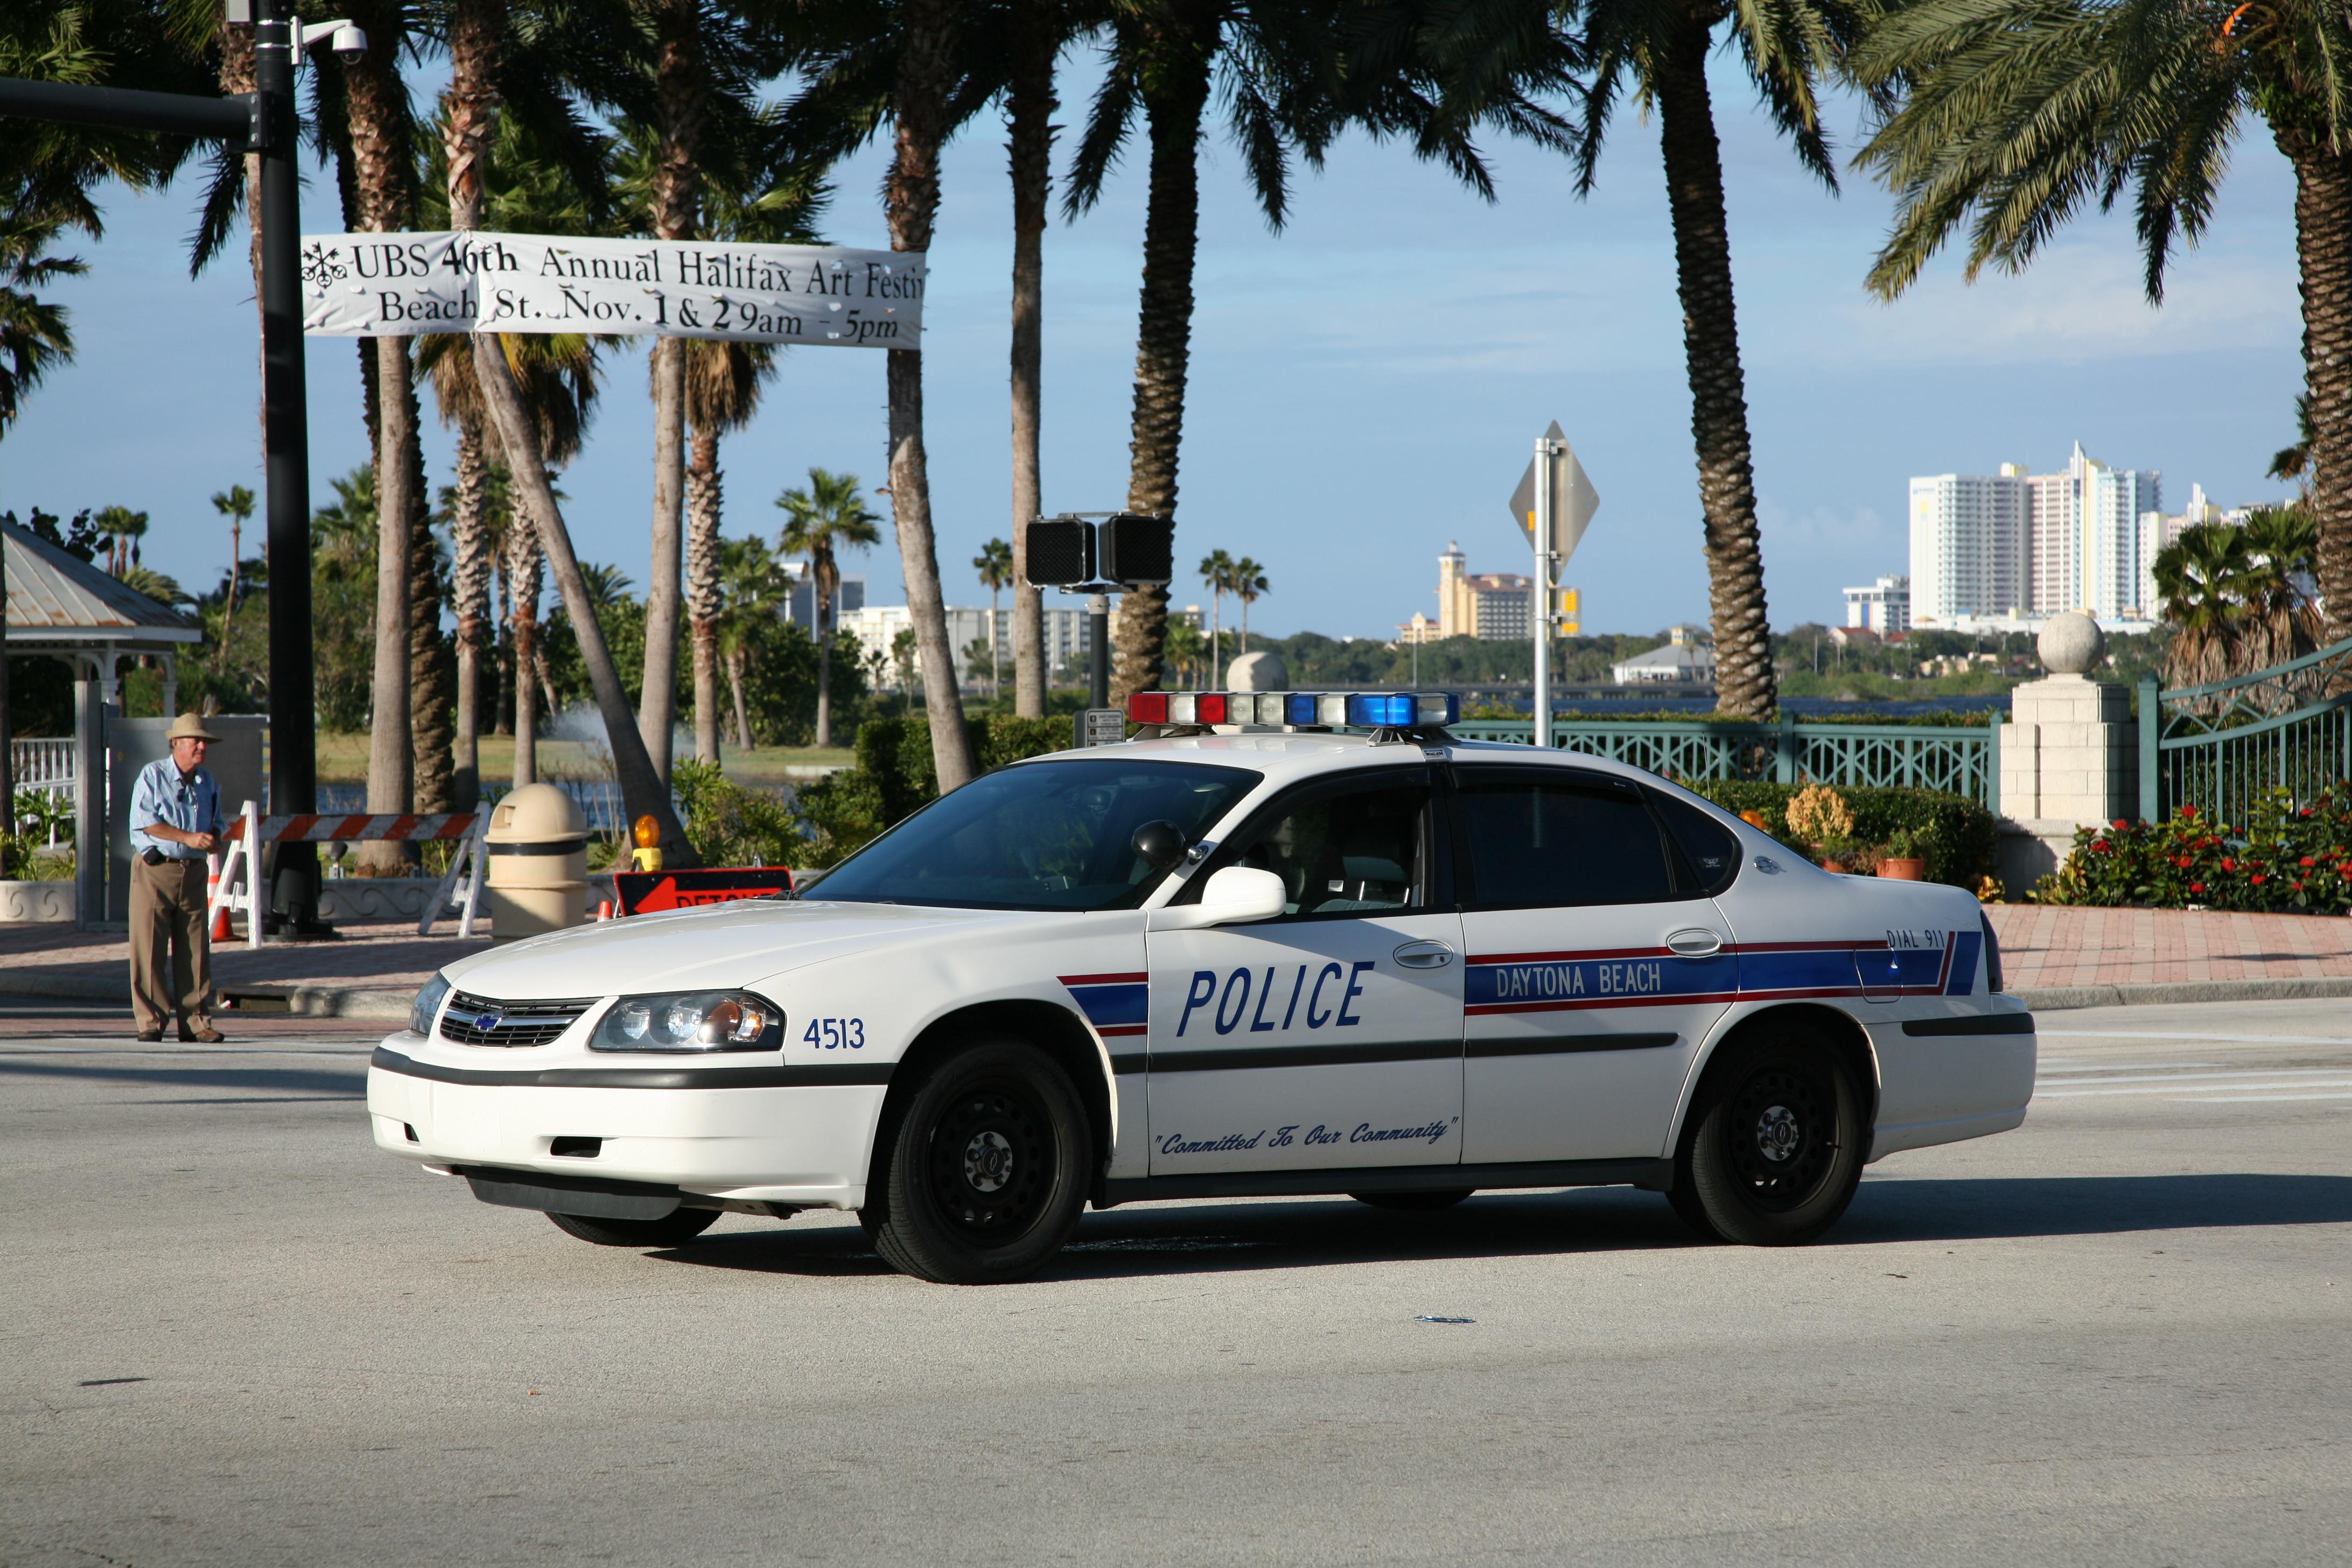 Daytona Beach Police Department - Wikipedia